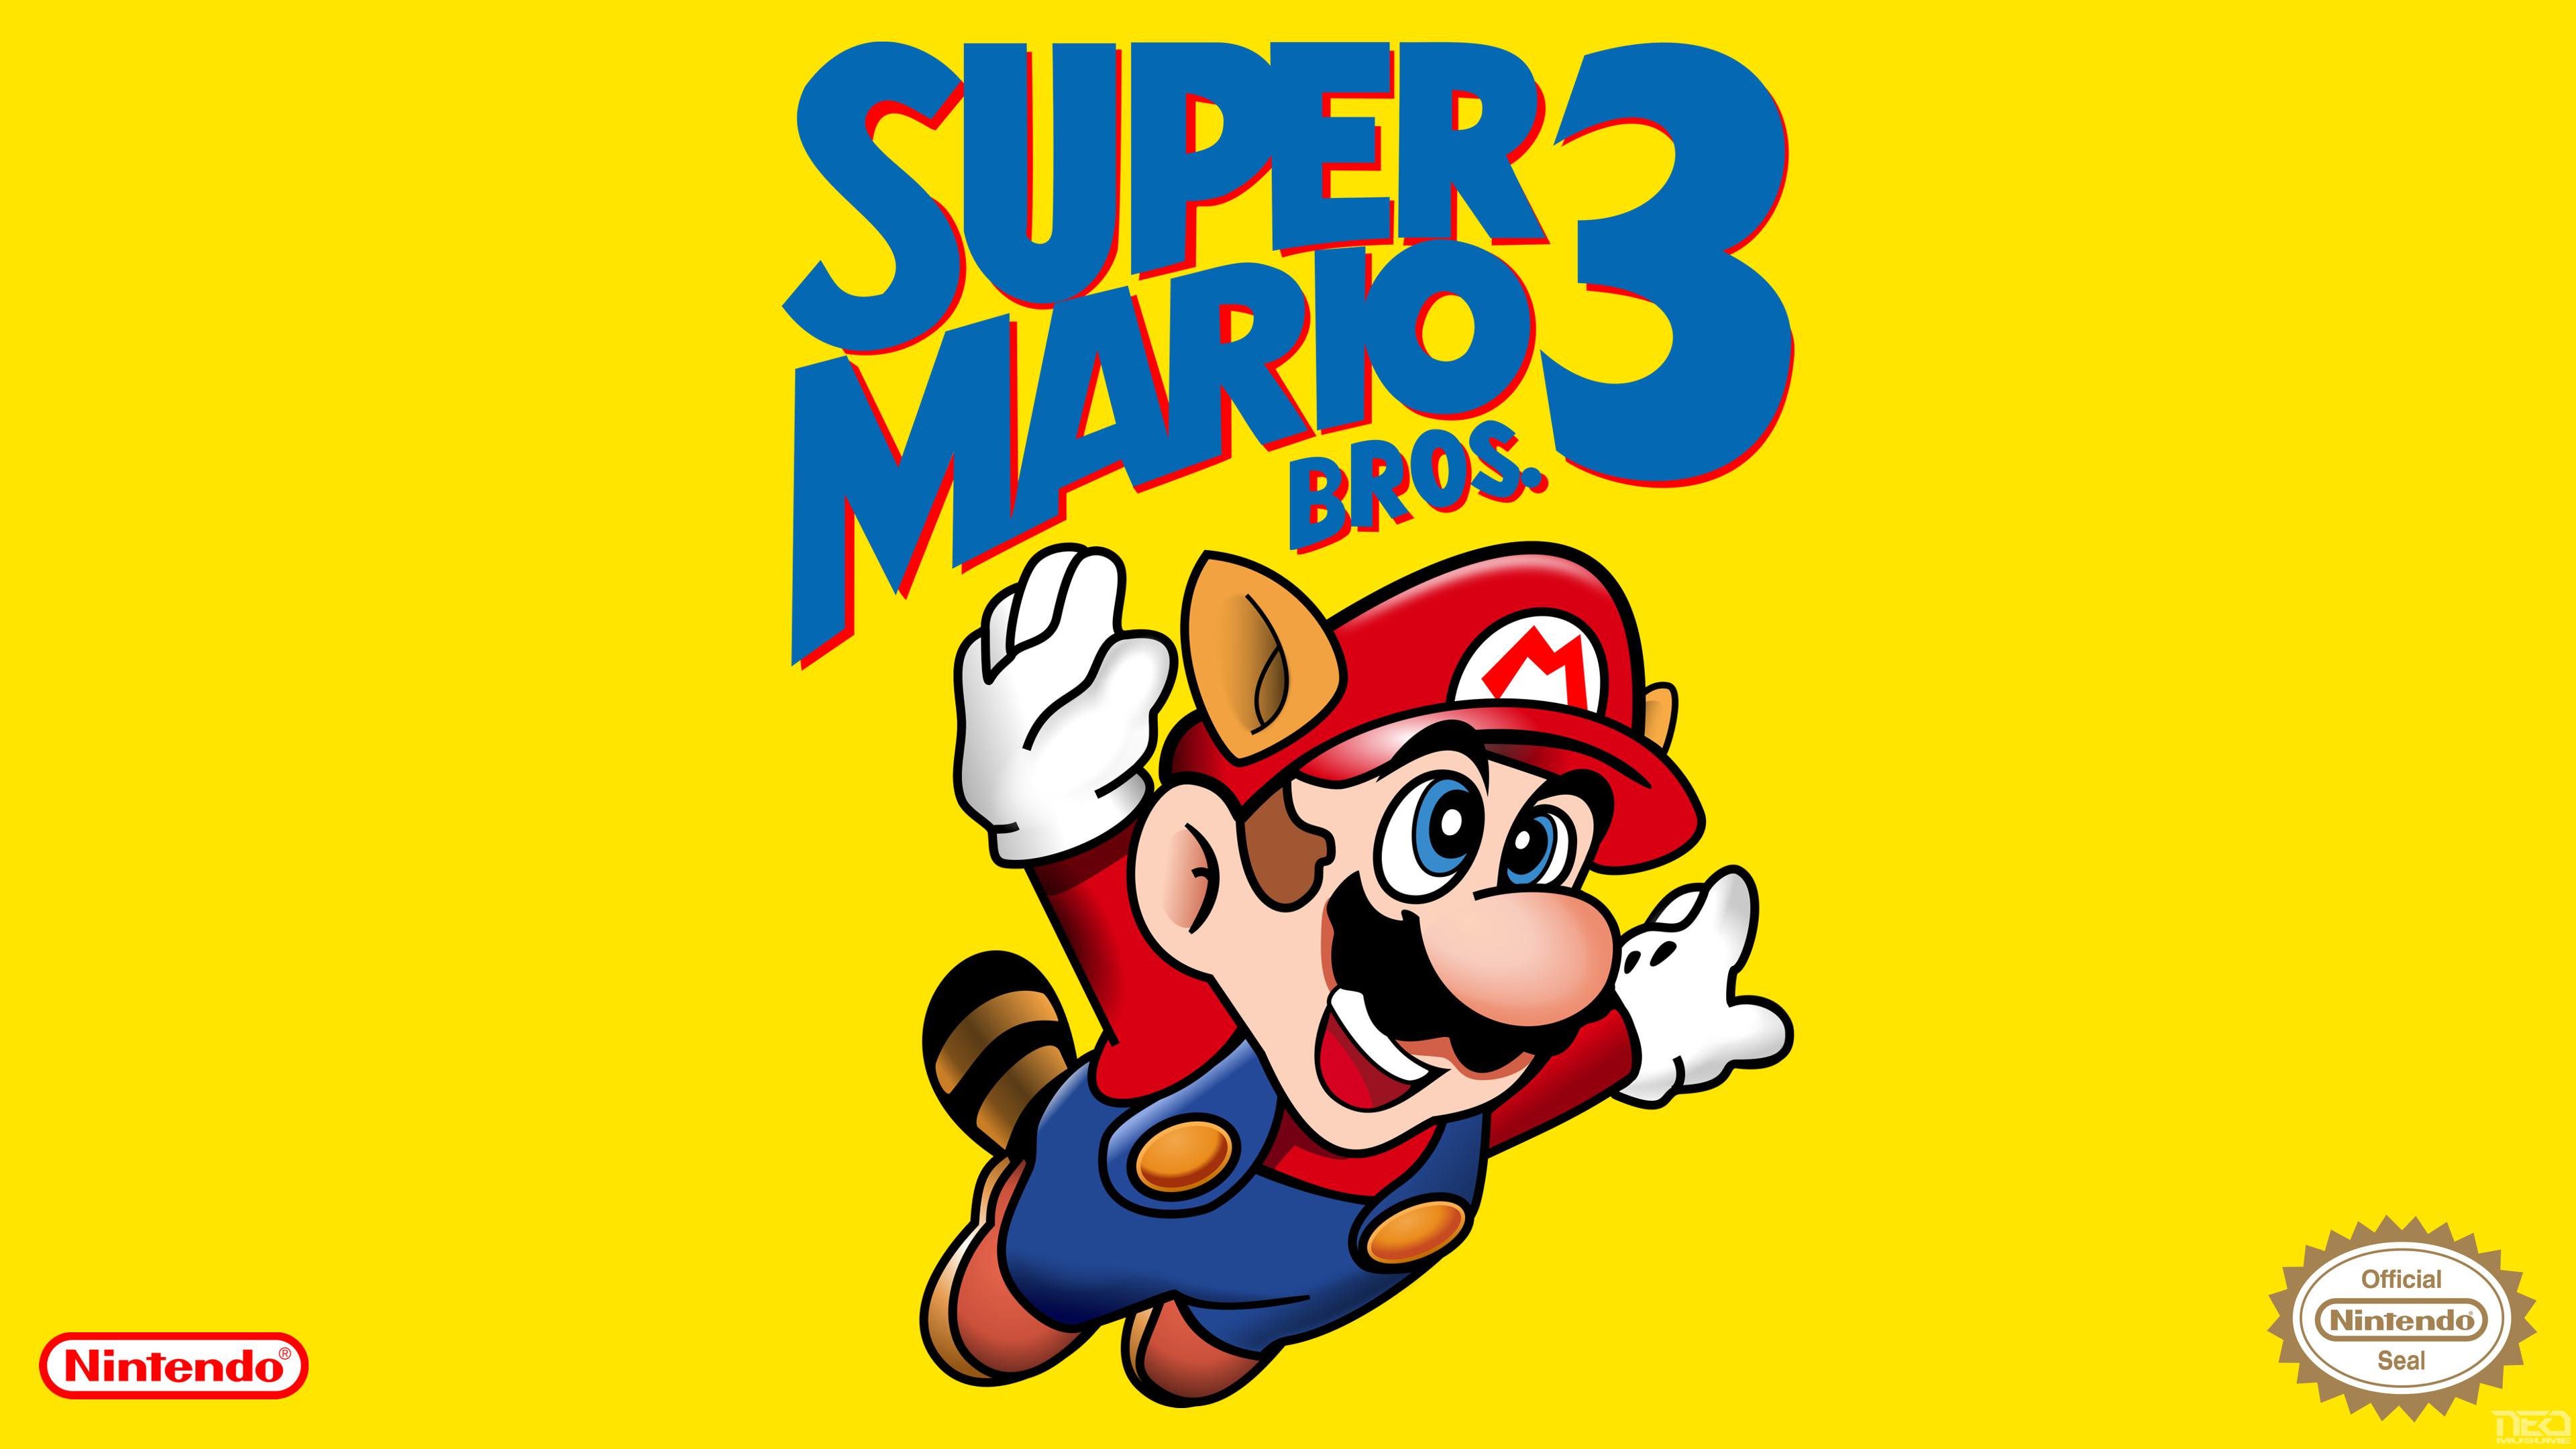 Super mario bros 3 by neo musume on deviantart super mario bros 3 by neo musume gumiabroncs Image collections